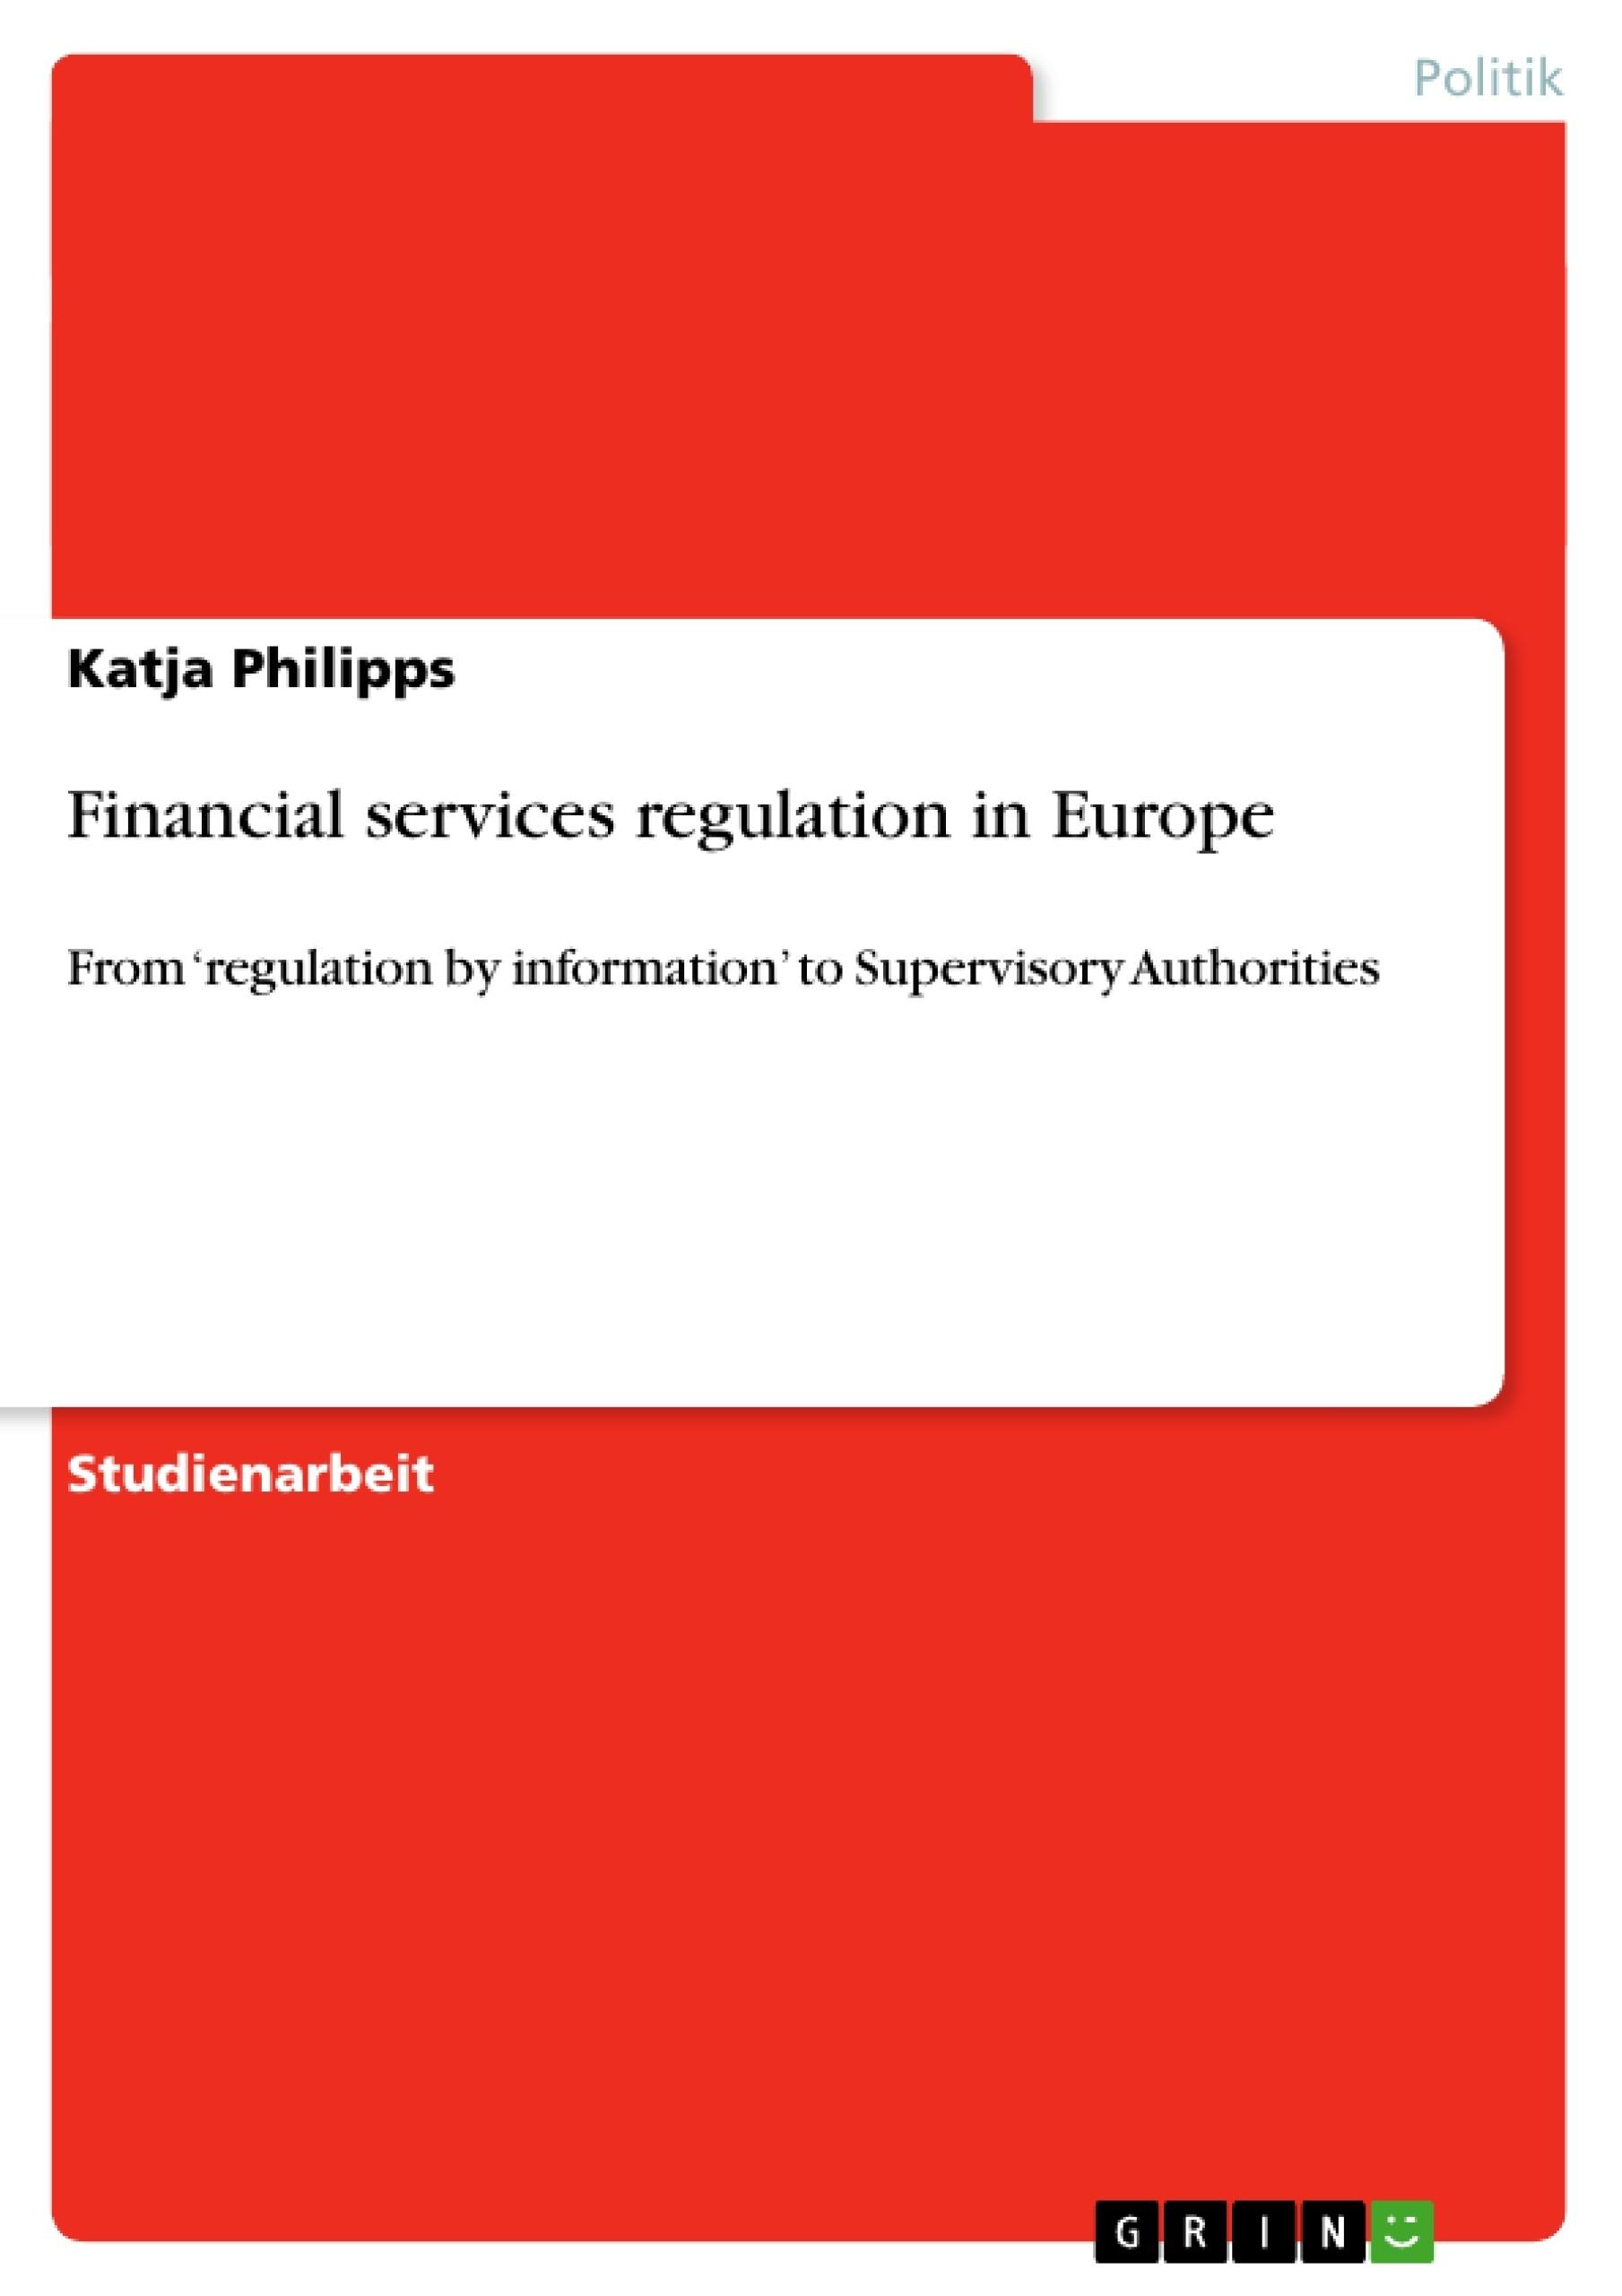 Titel: Financial services regulation in Europe